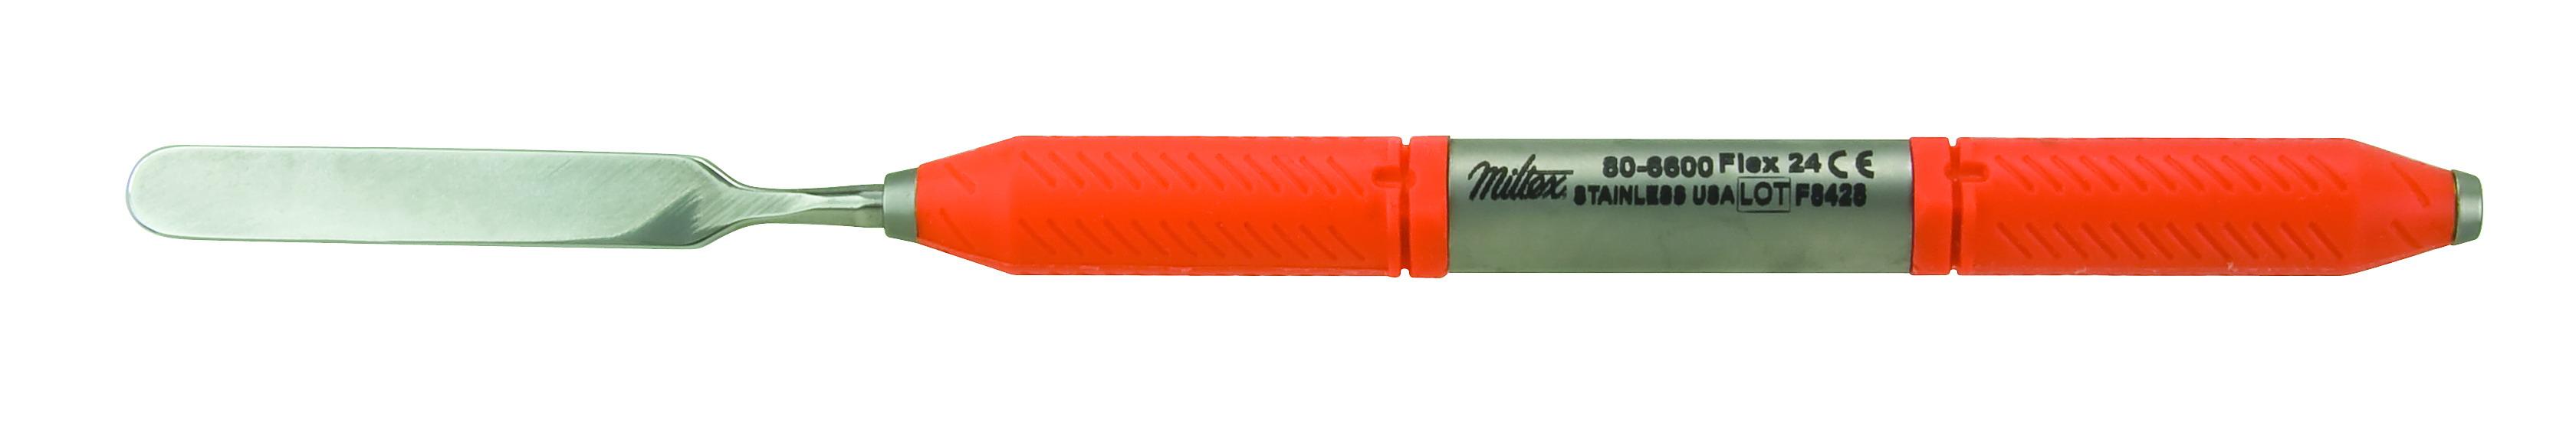 spatula-cement-flex-24-80-6600-miltex.jpg